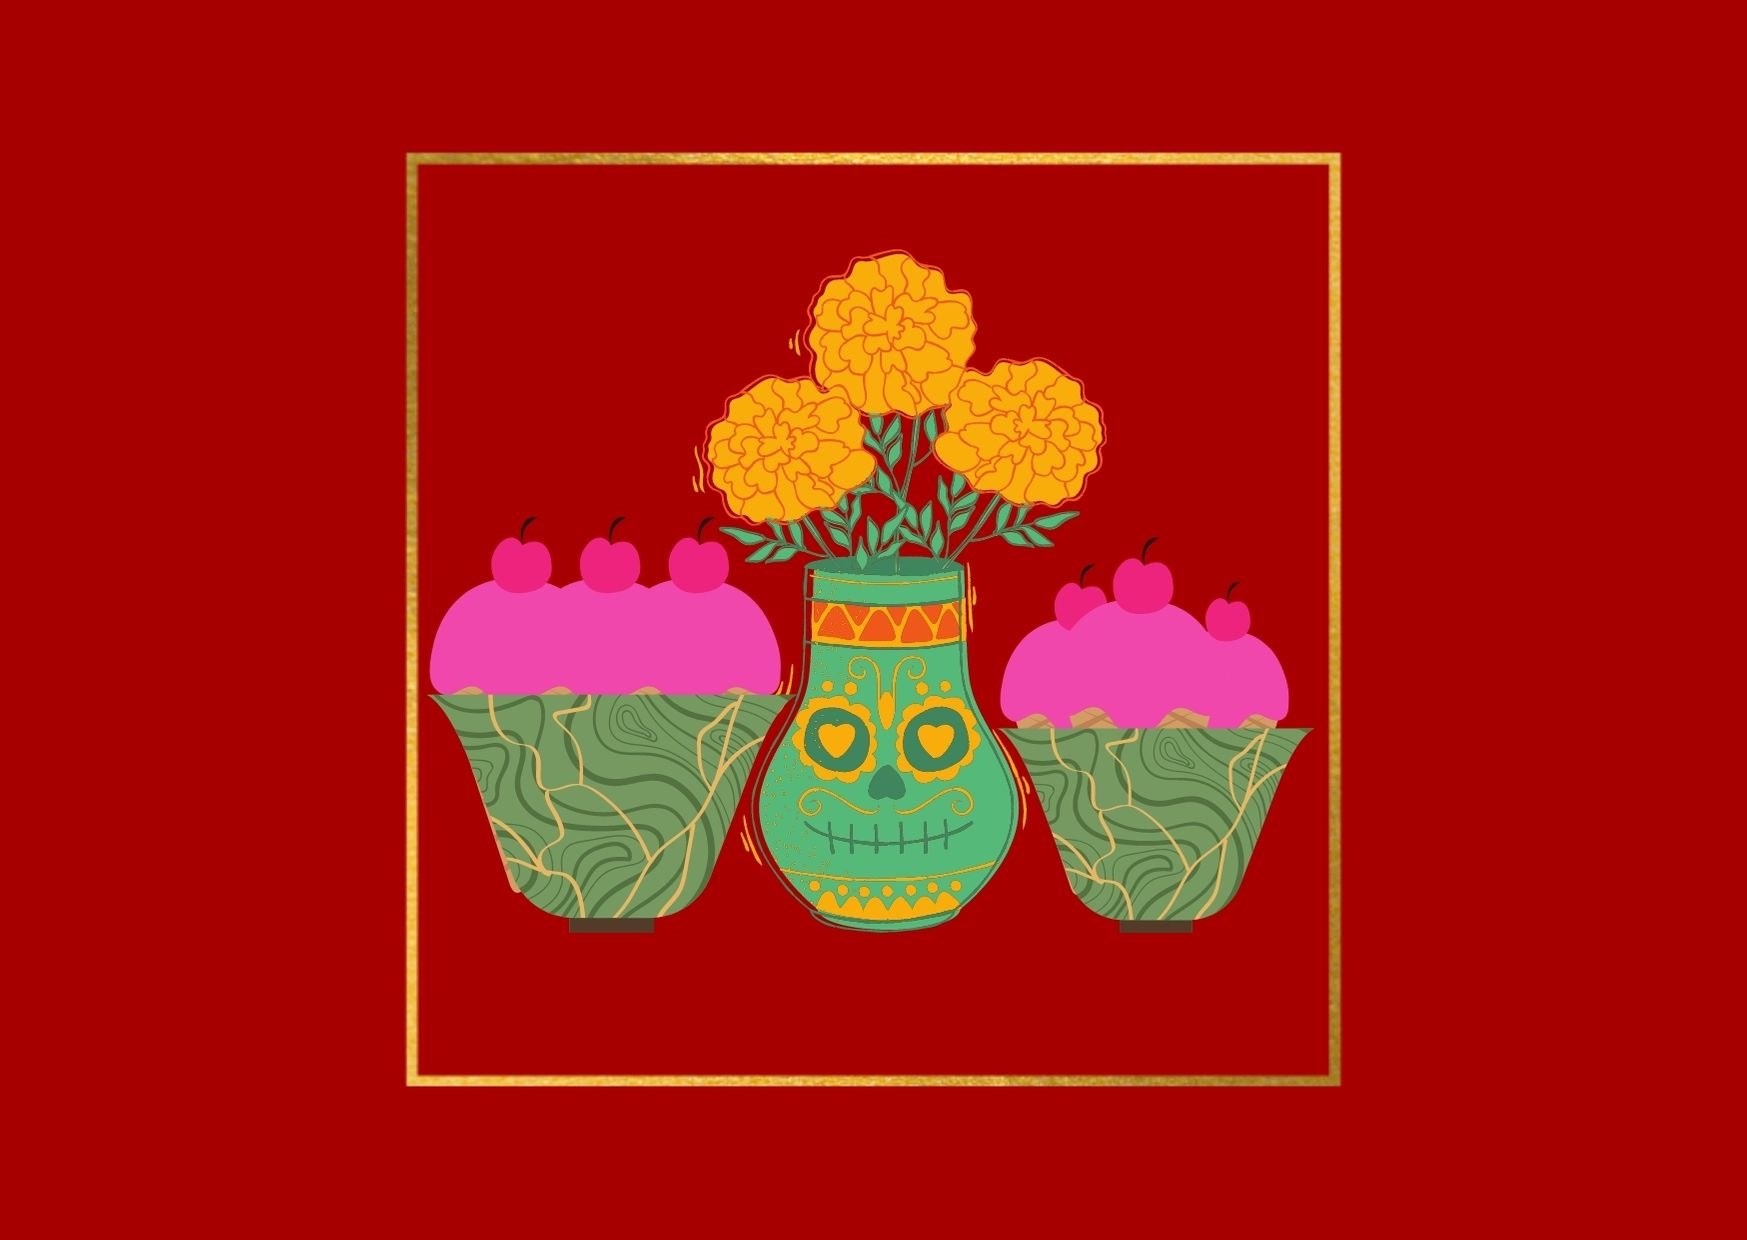 TARA RITUAL & THANGTONG GYALPO PRAYER - Khenpo Tashi Sangpo